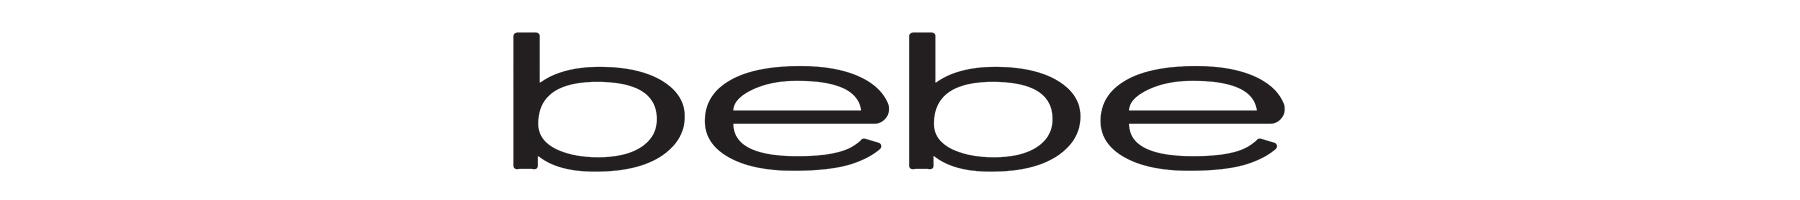 DrJays.com - Bebe